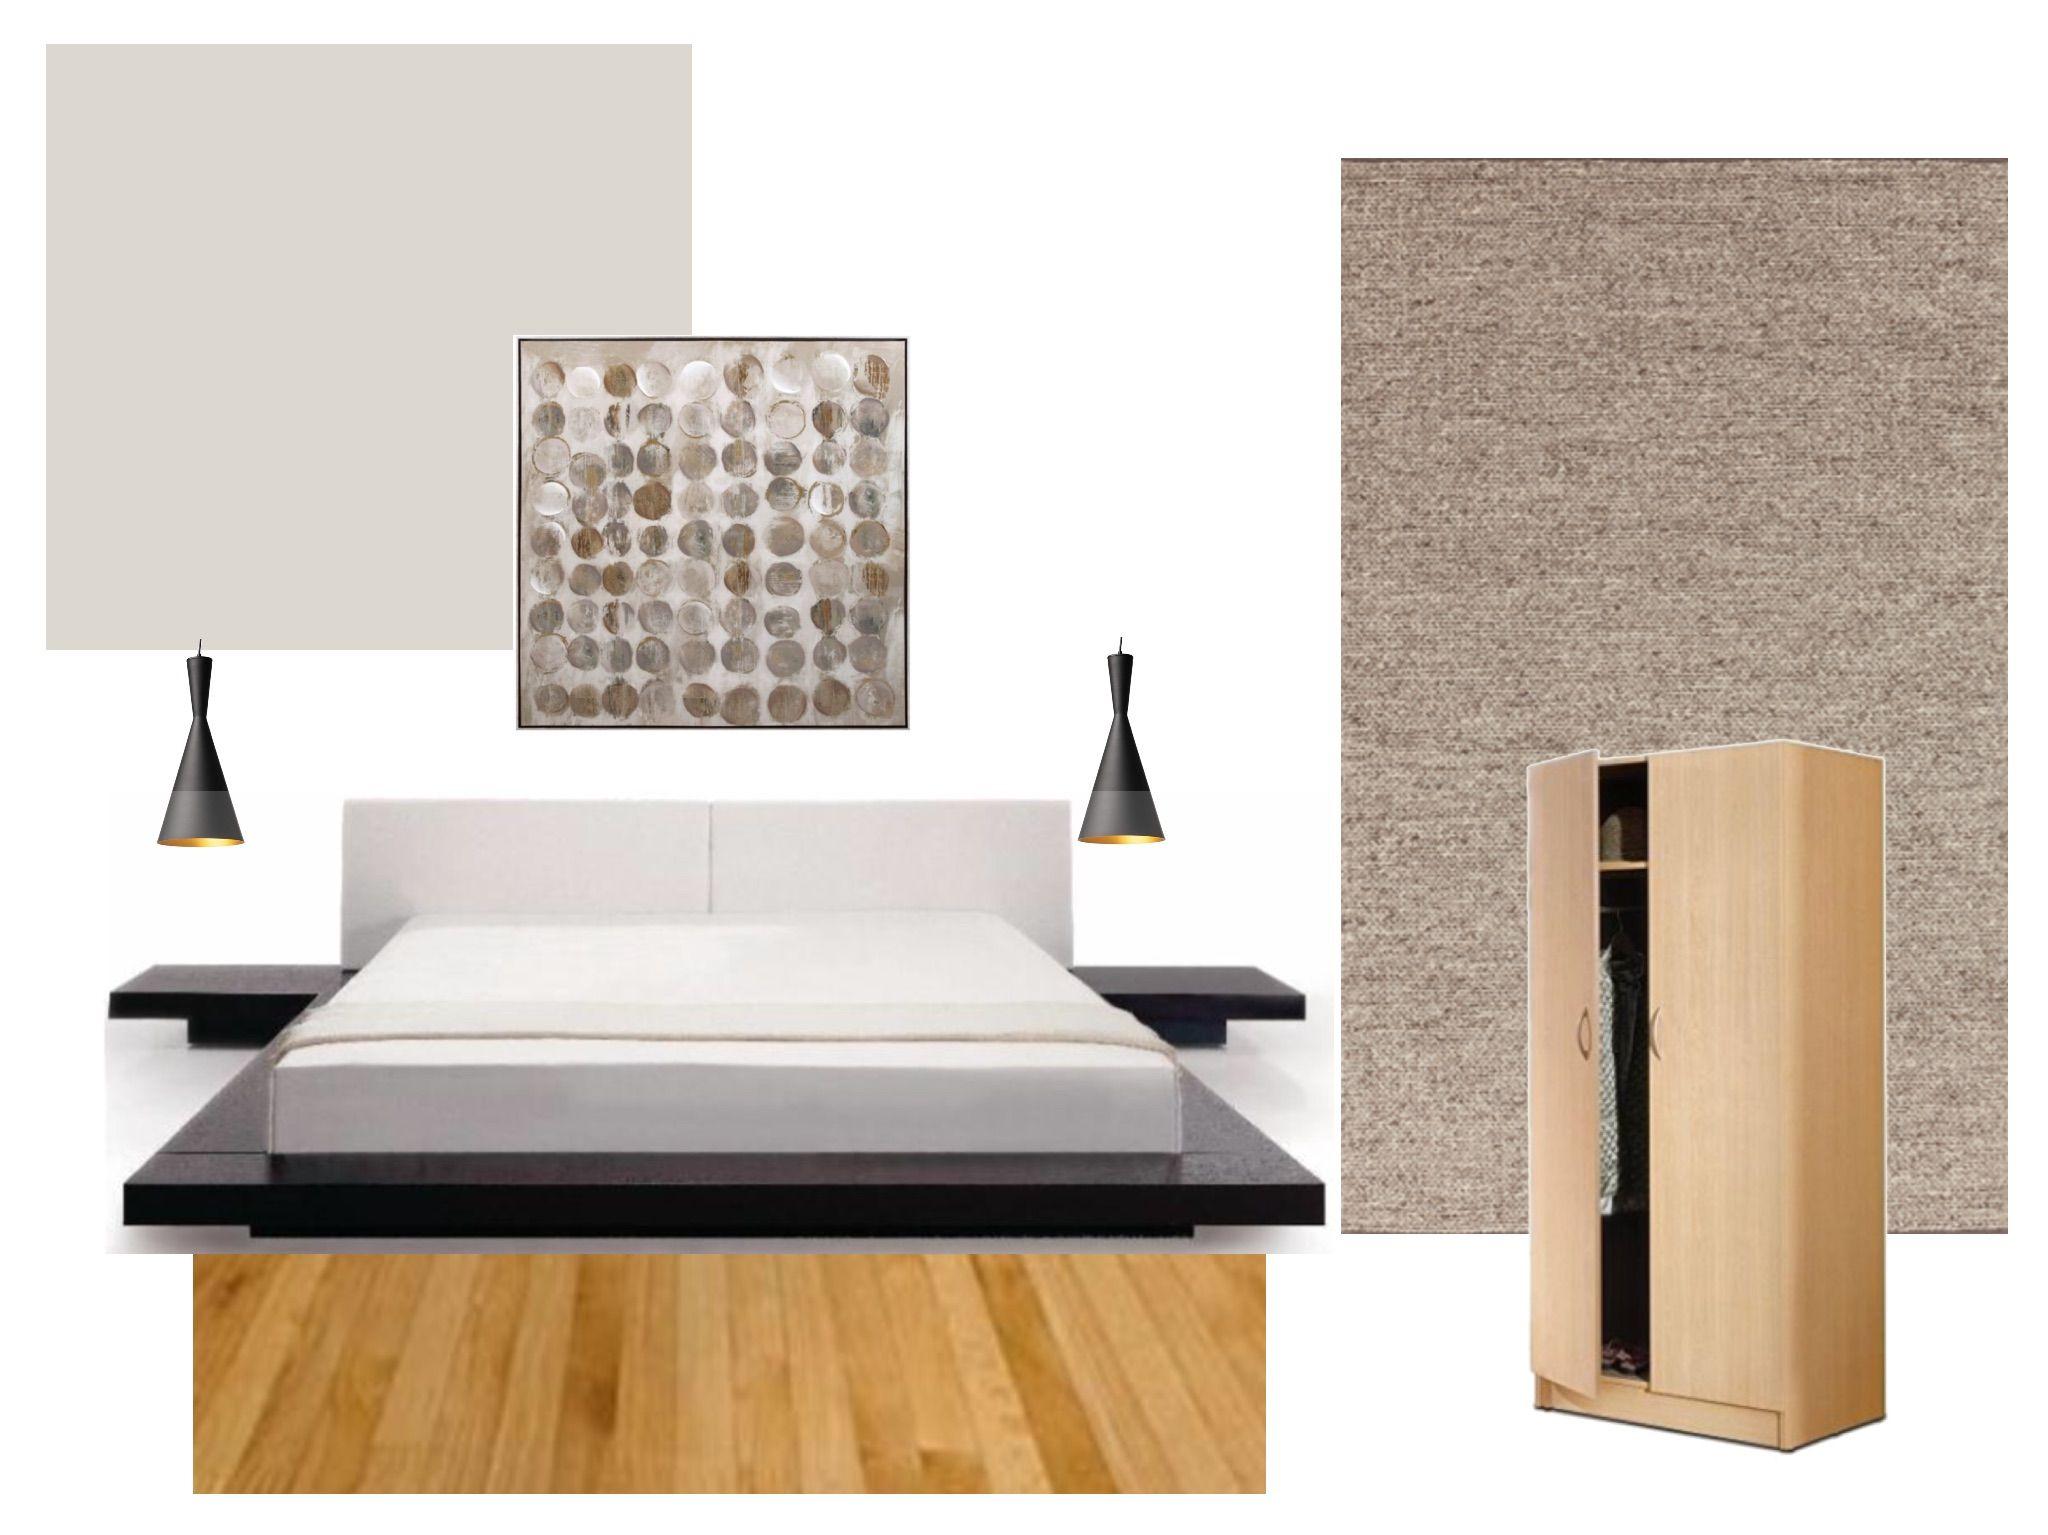 Rustic master bedroom, wood wardrobes, black pendants, low